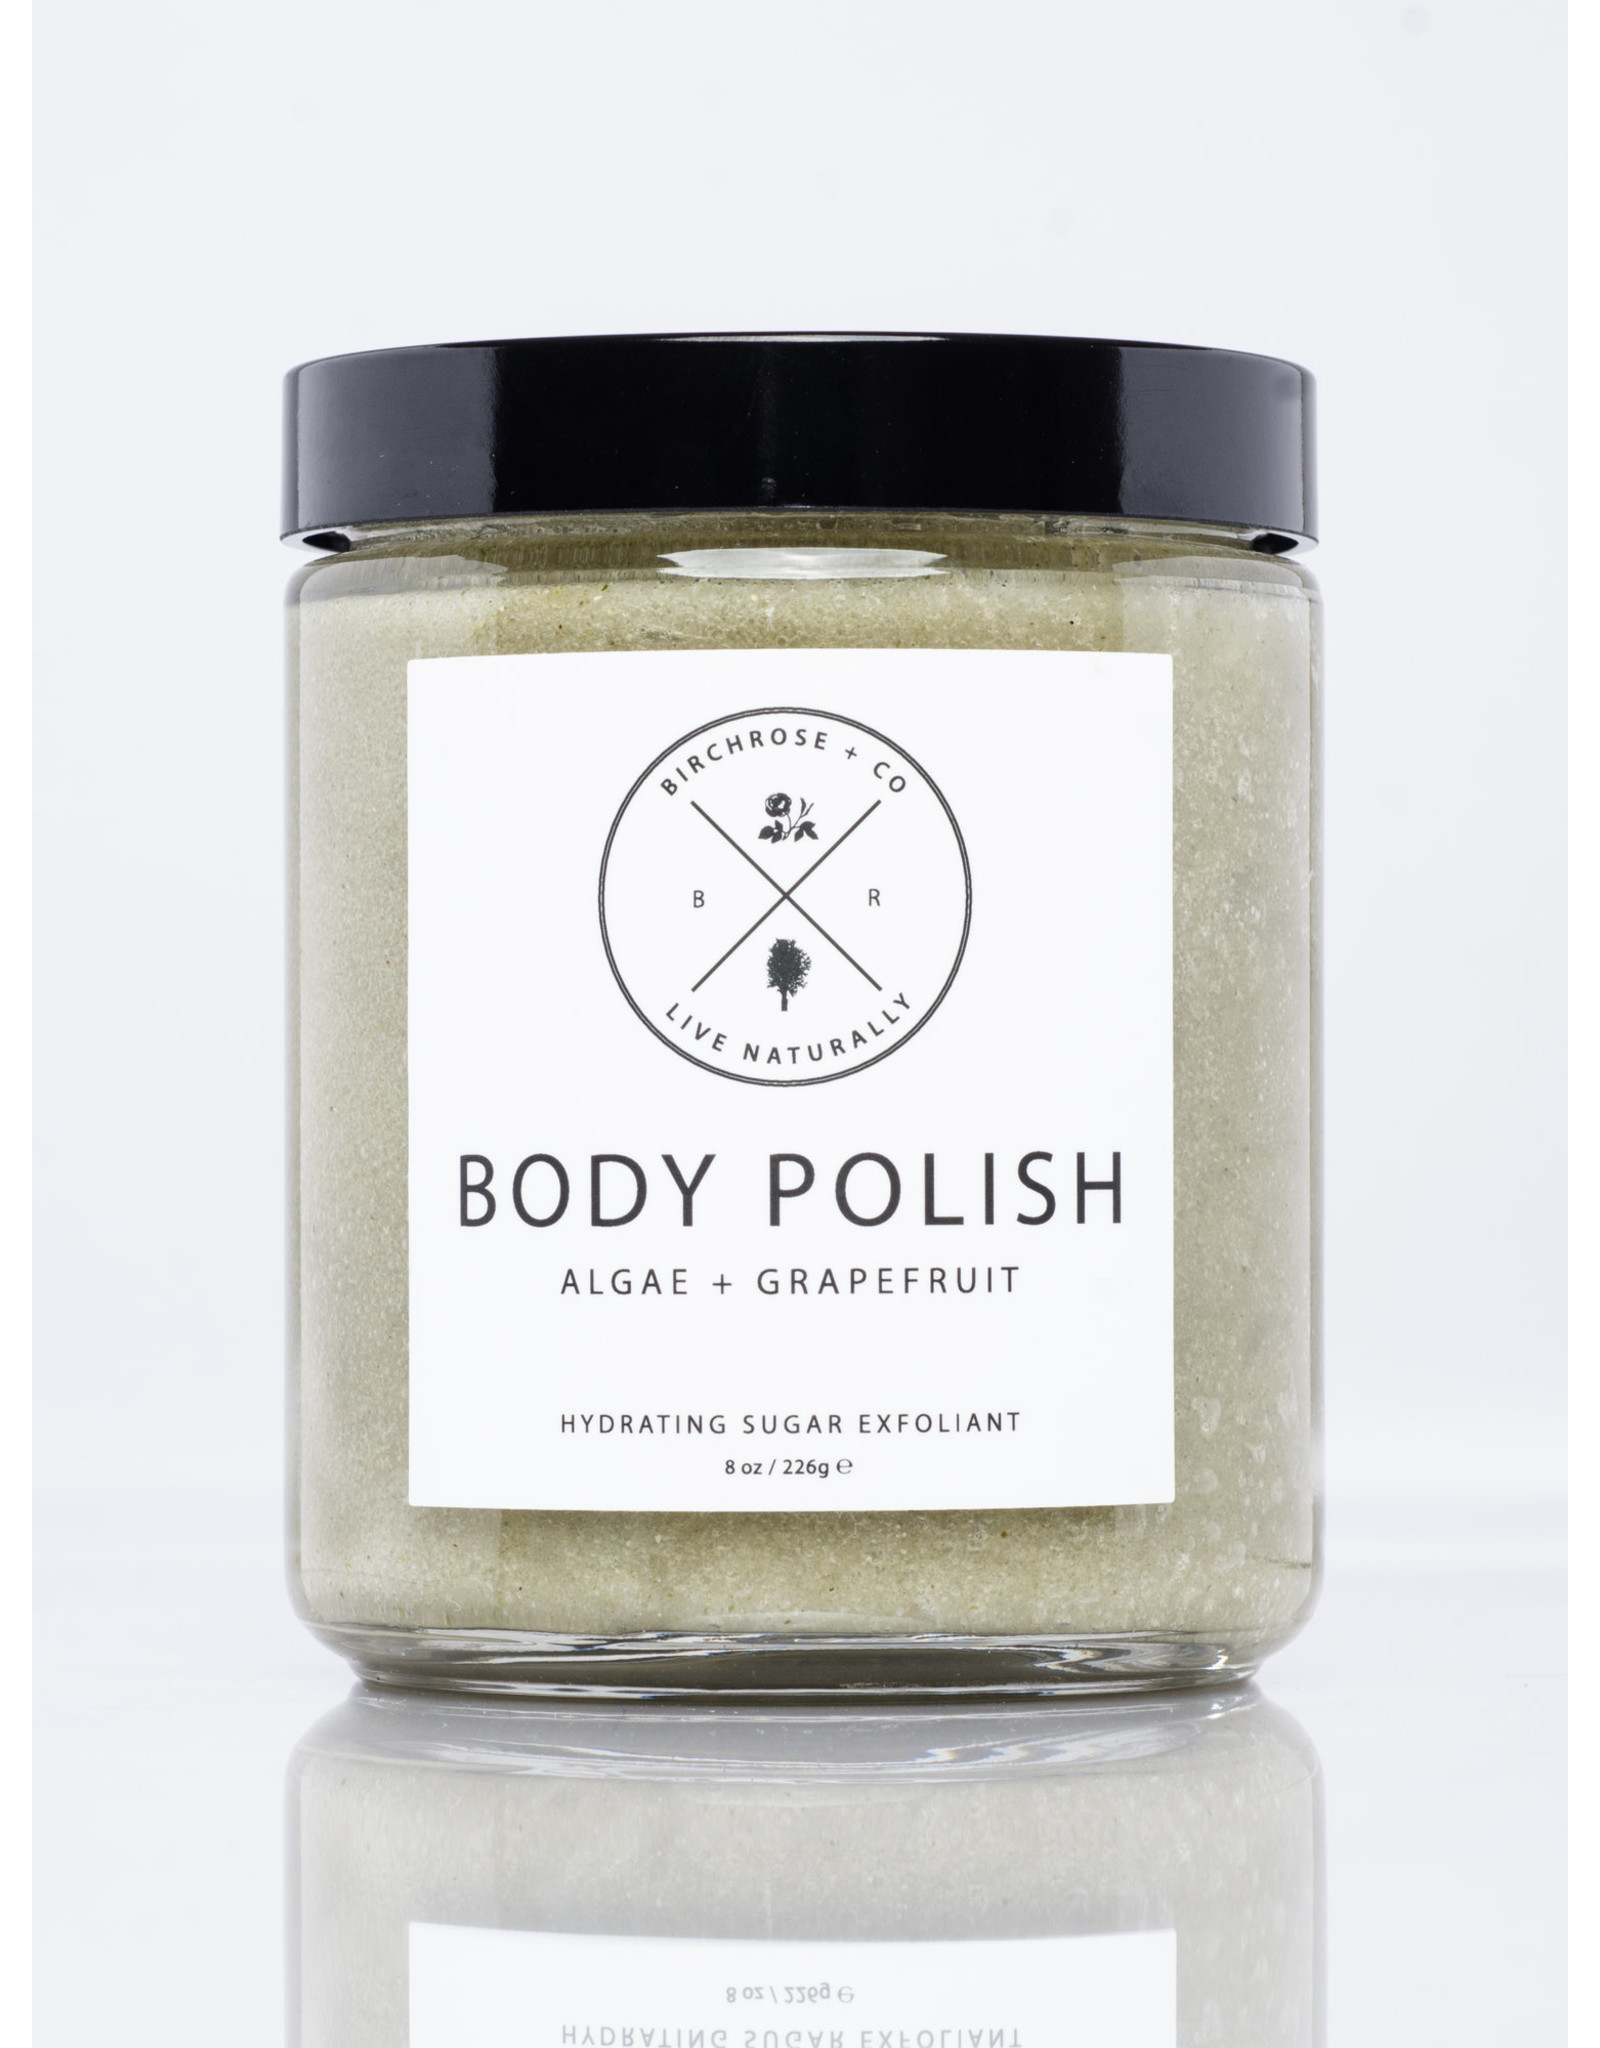 Body Polish - Algae & Grapefruit